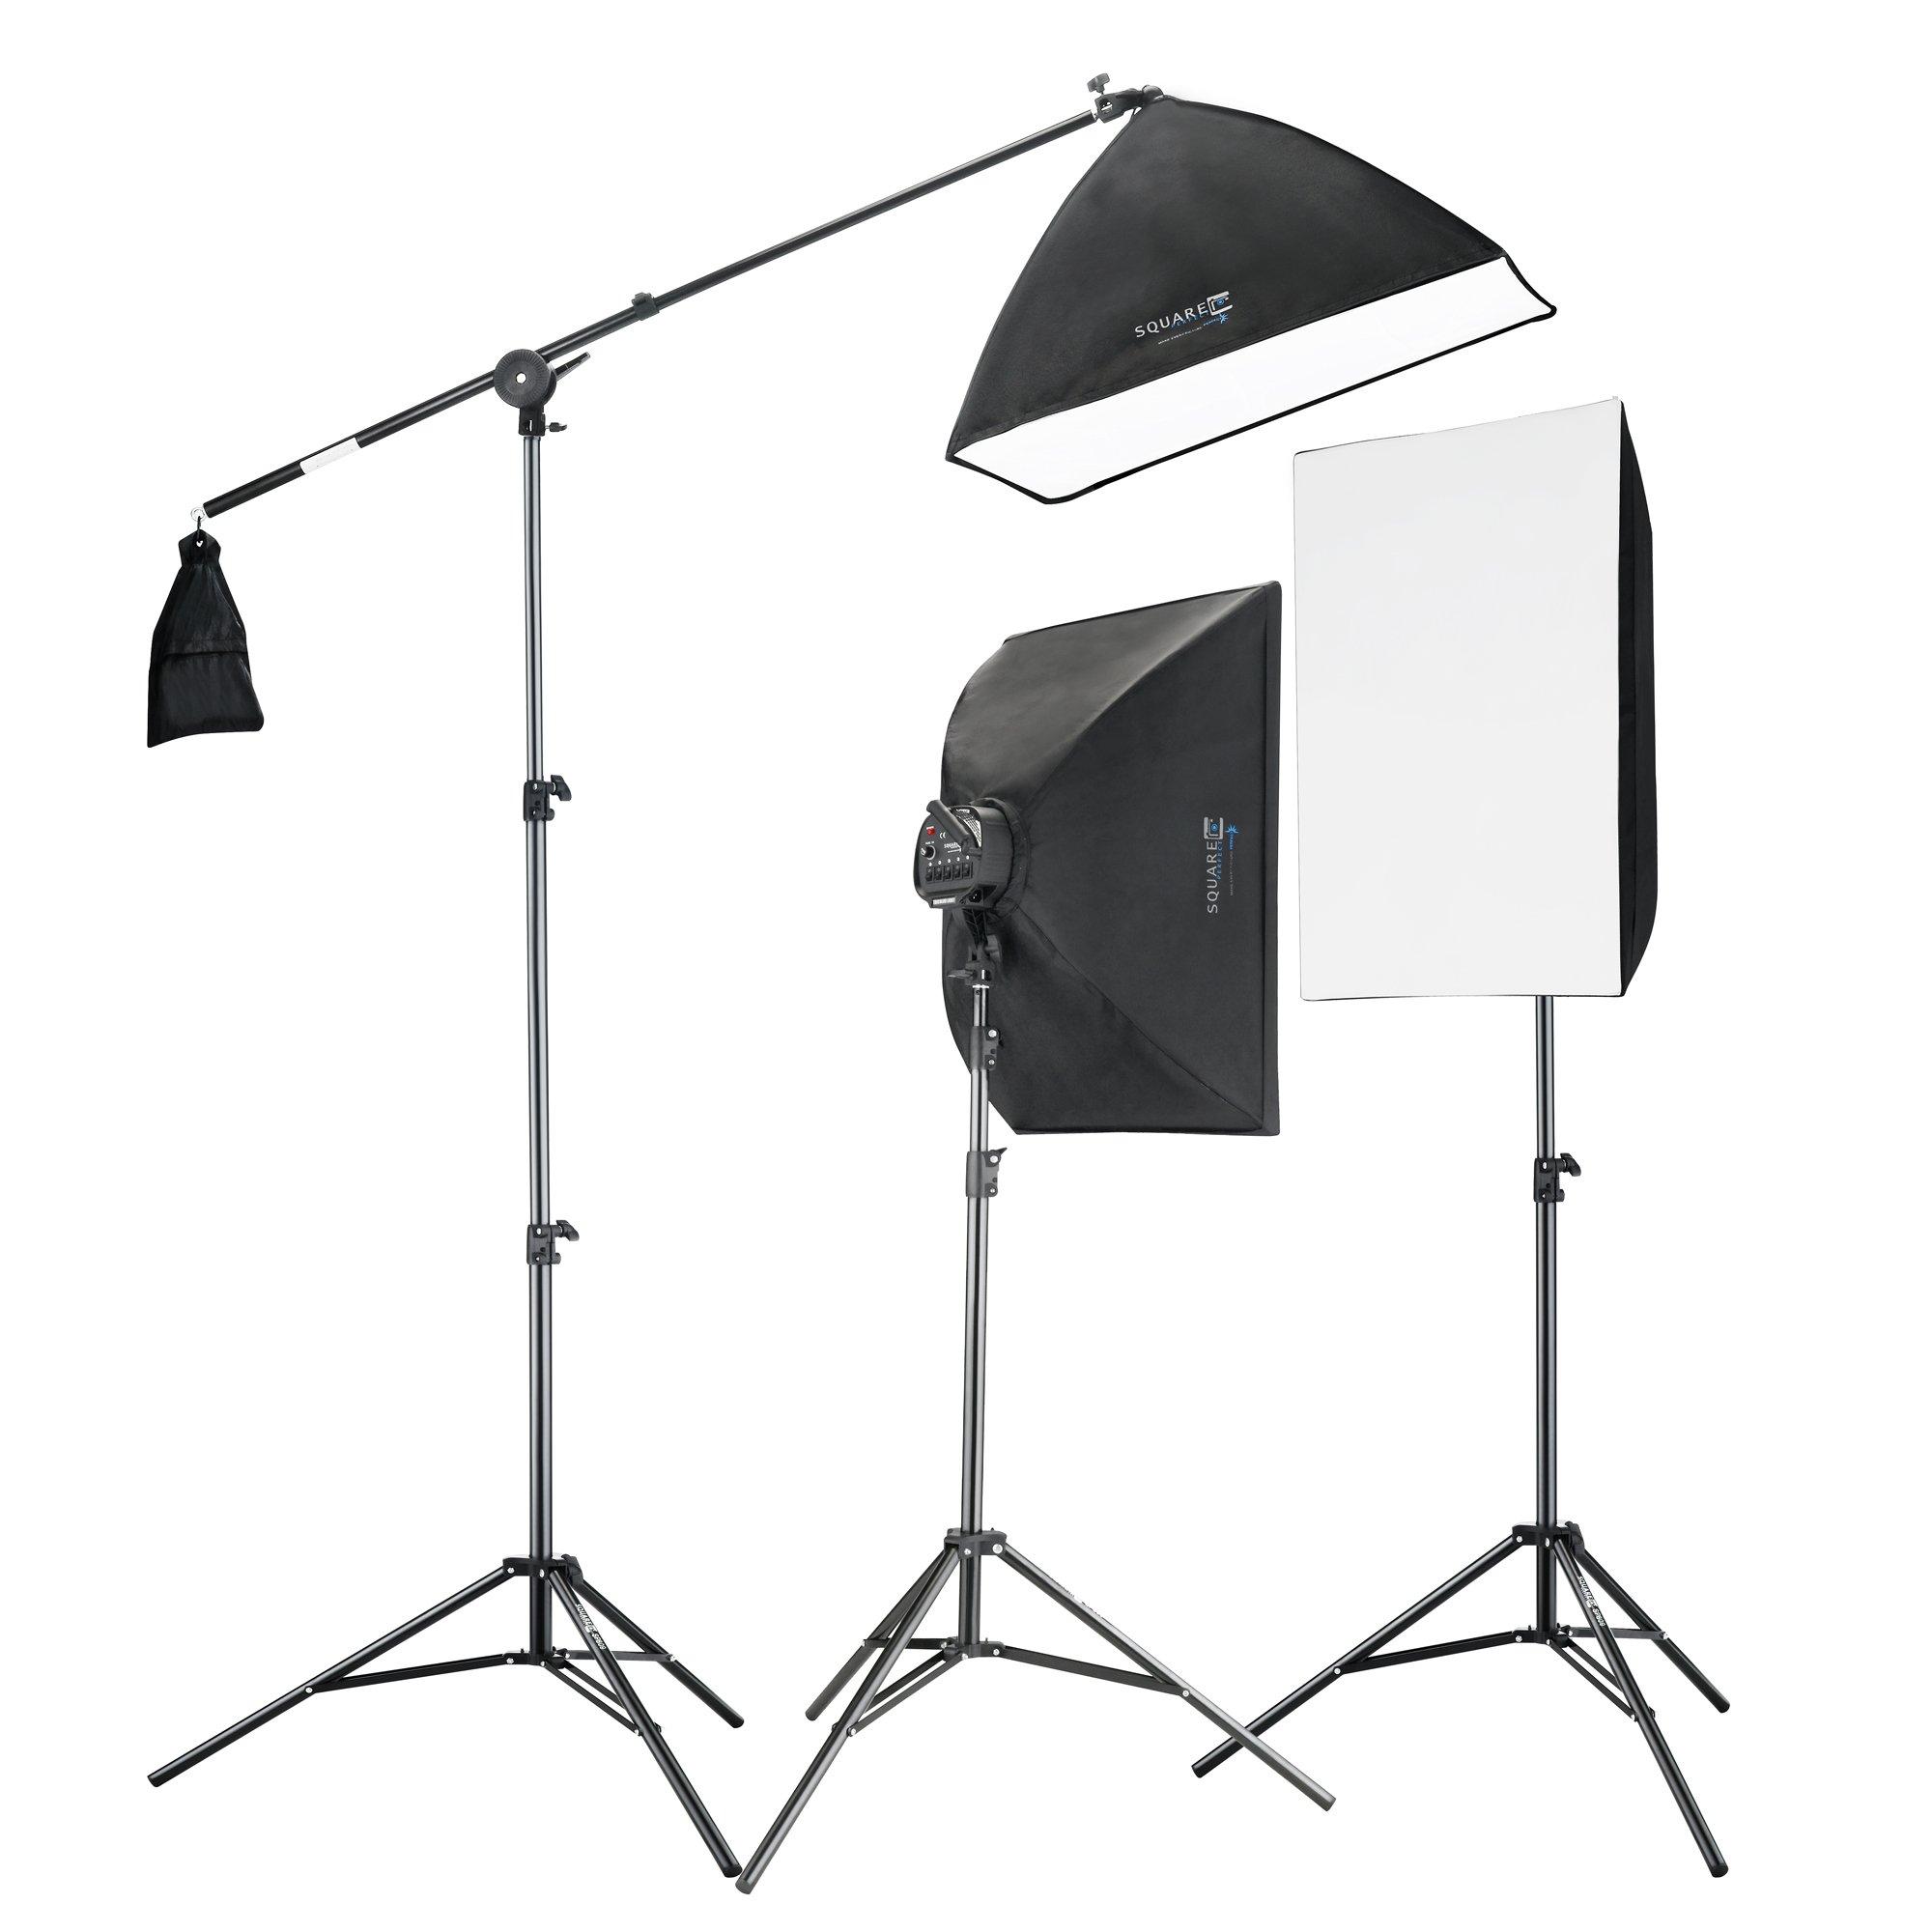 Square Perfect 2815 Professional Quality 2275W Digital Video Softbox Lighting Kit Boom Stand